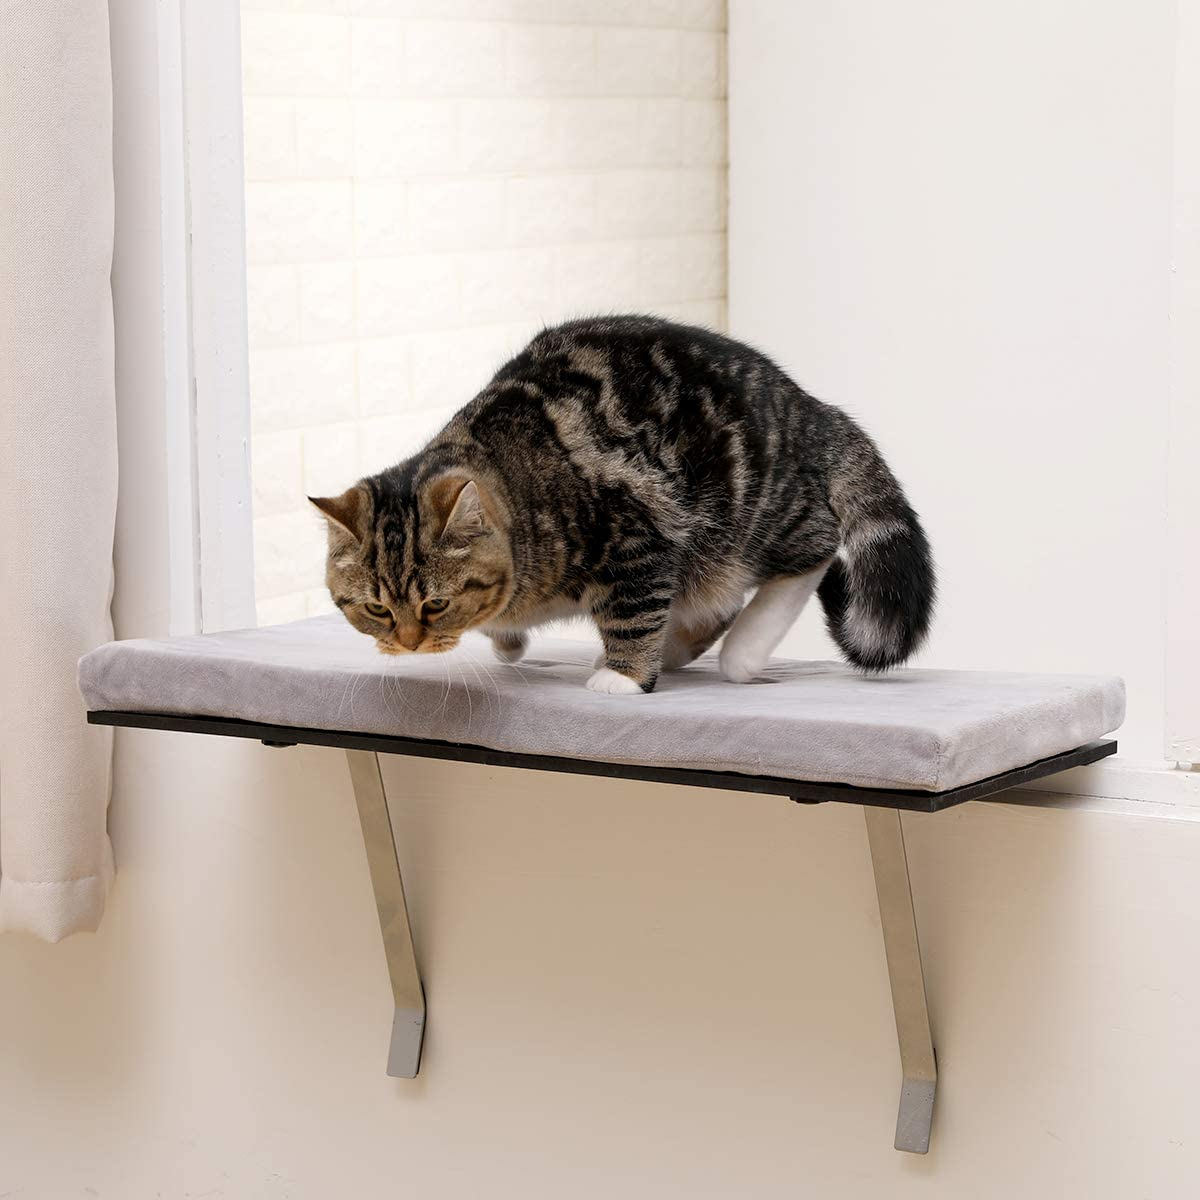 Amazon Com Sweetgo Cat Window Perch Mounted Shelf Bed For Cat Funny Sleep Diy Kitty Sill Window Perch Washable Foam Cat Seat Pet Supplies